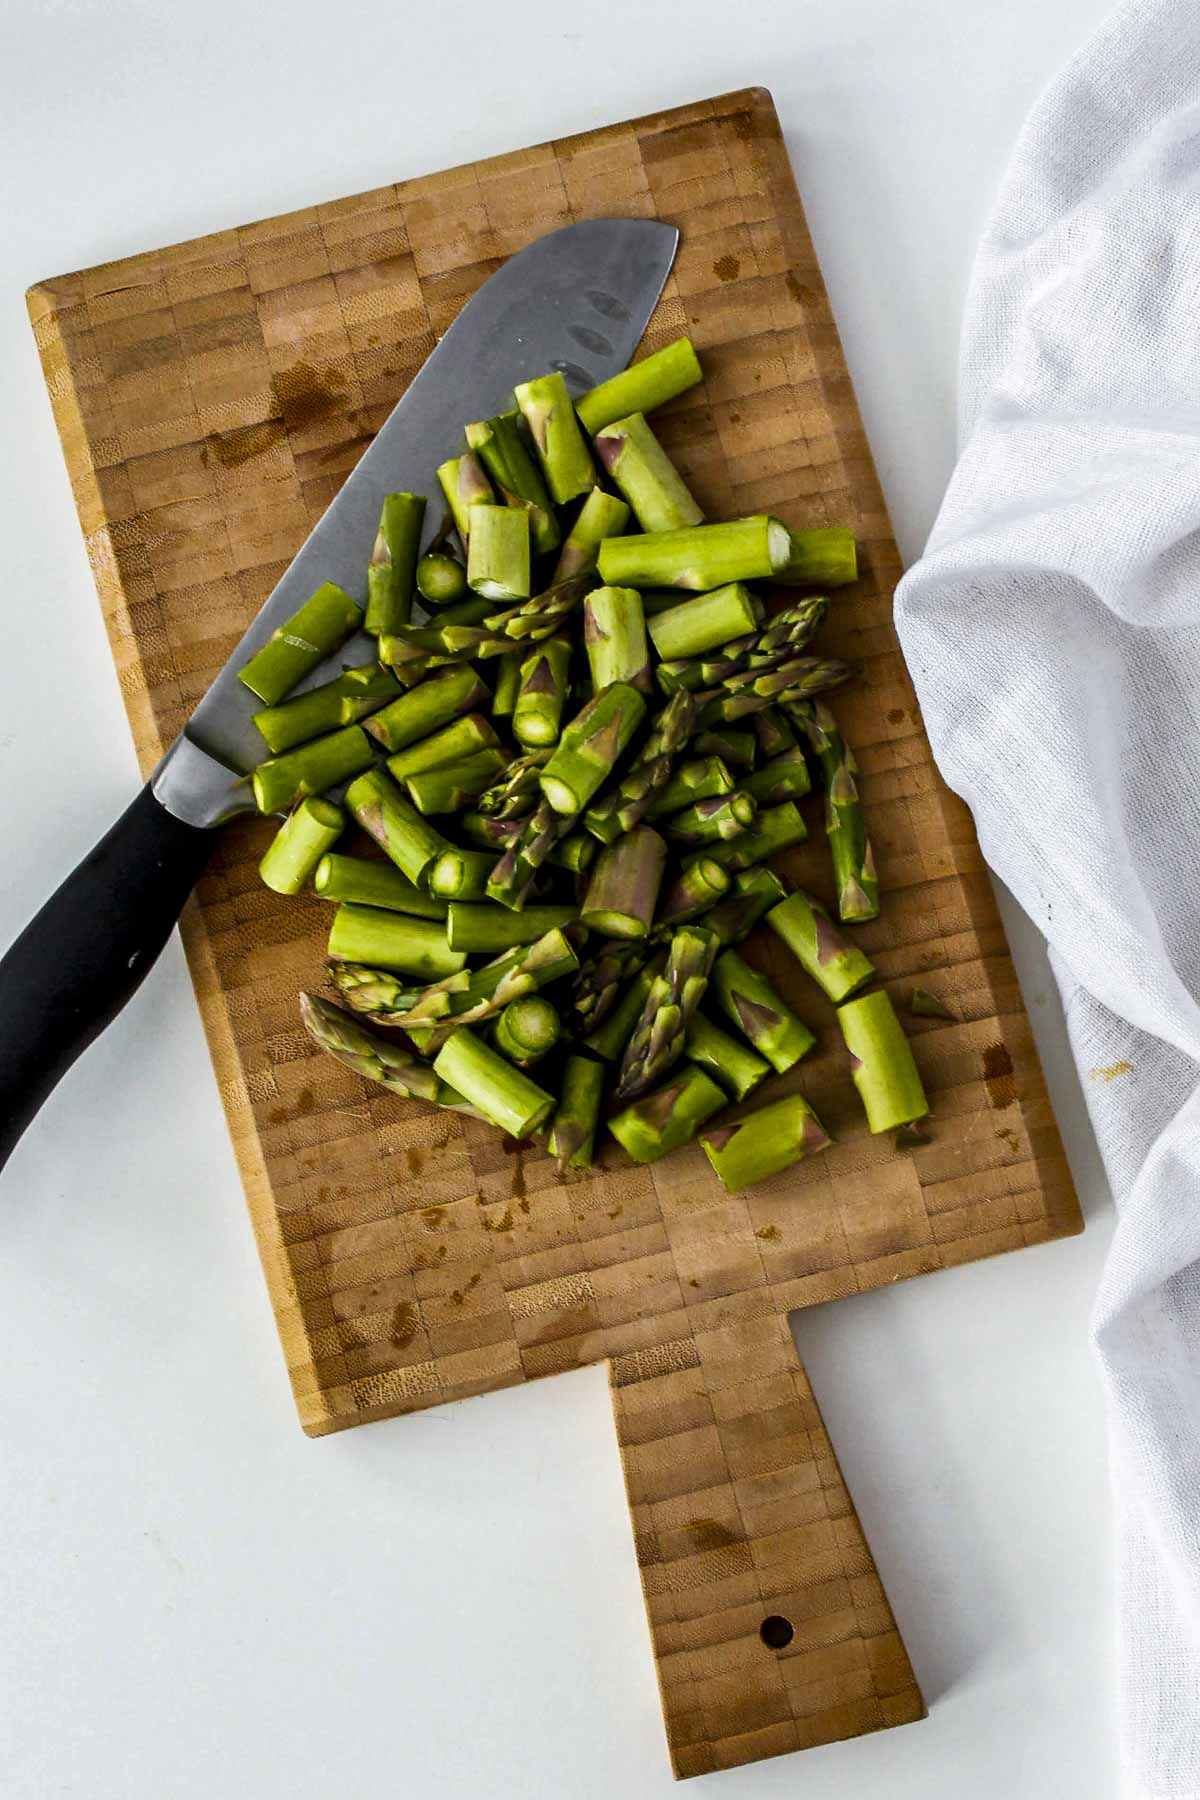 Asparagus cut on a cutting board.